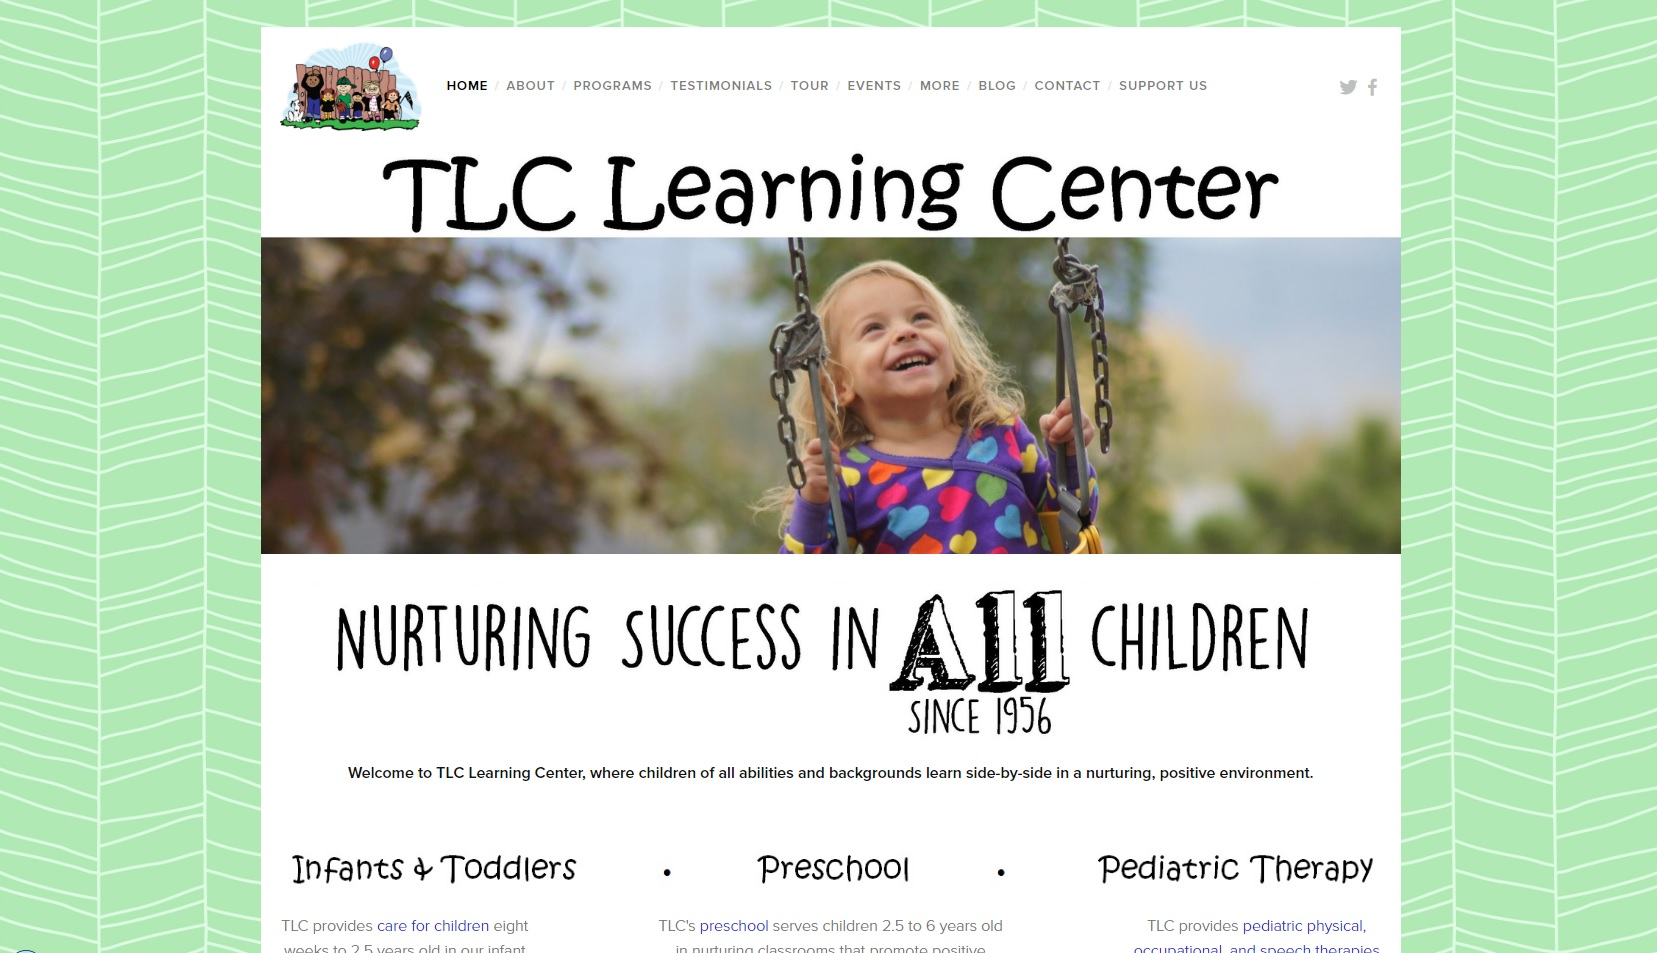 TLC Learning Center website